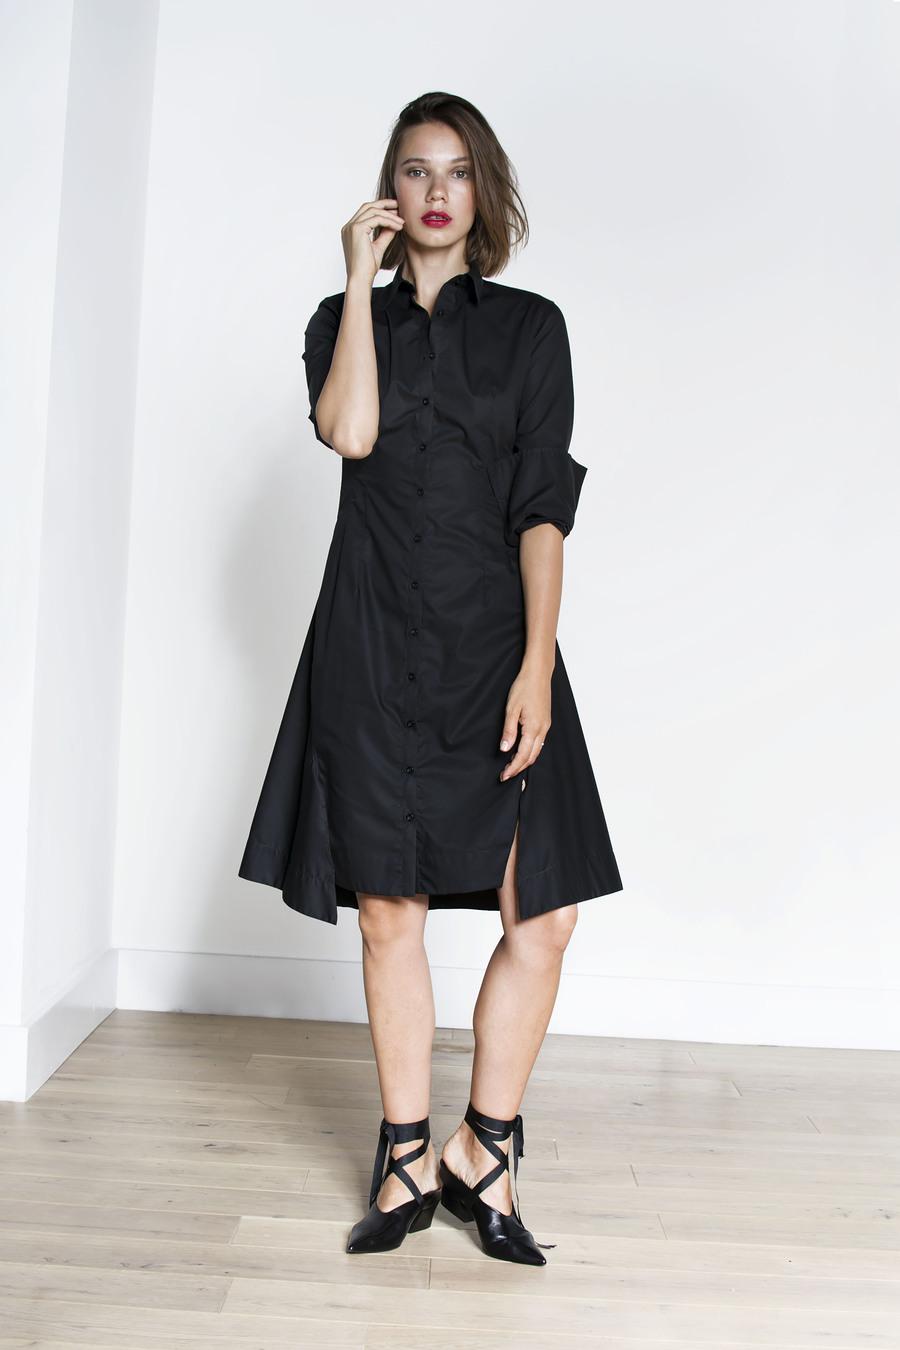 Uma dress with Aleks / Designer jettbrunette / Uploaded 12th January 2018 @ 03:41 PM